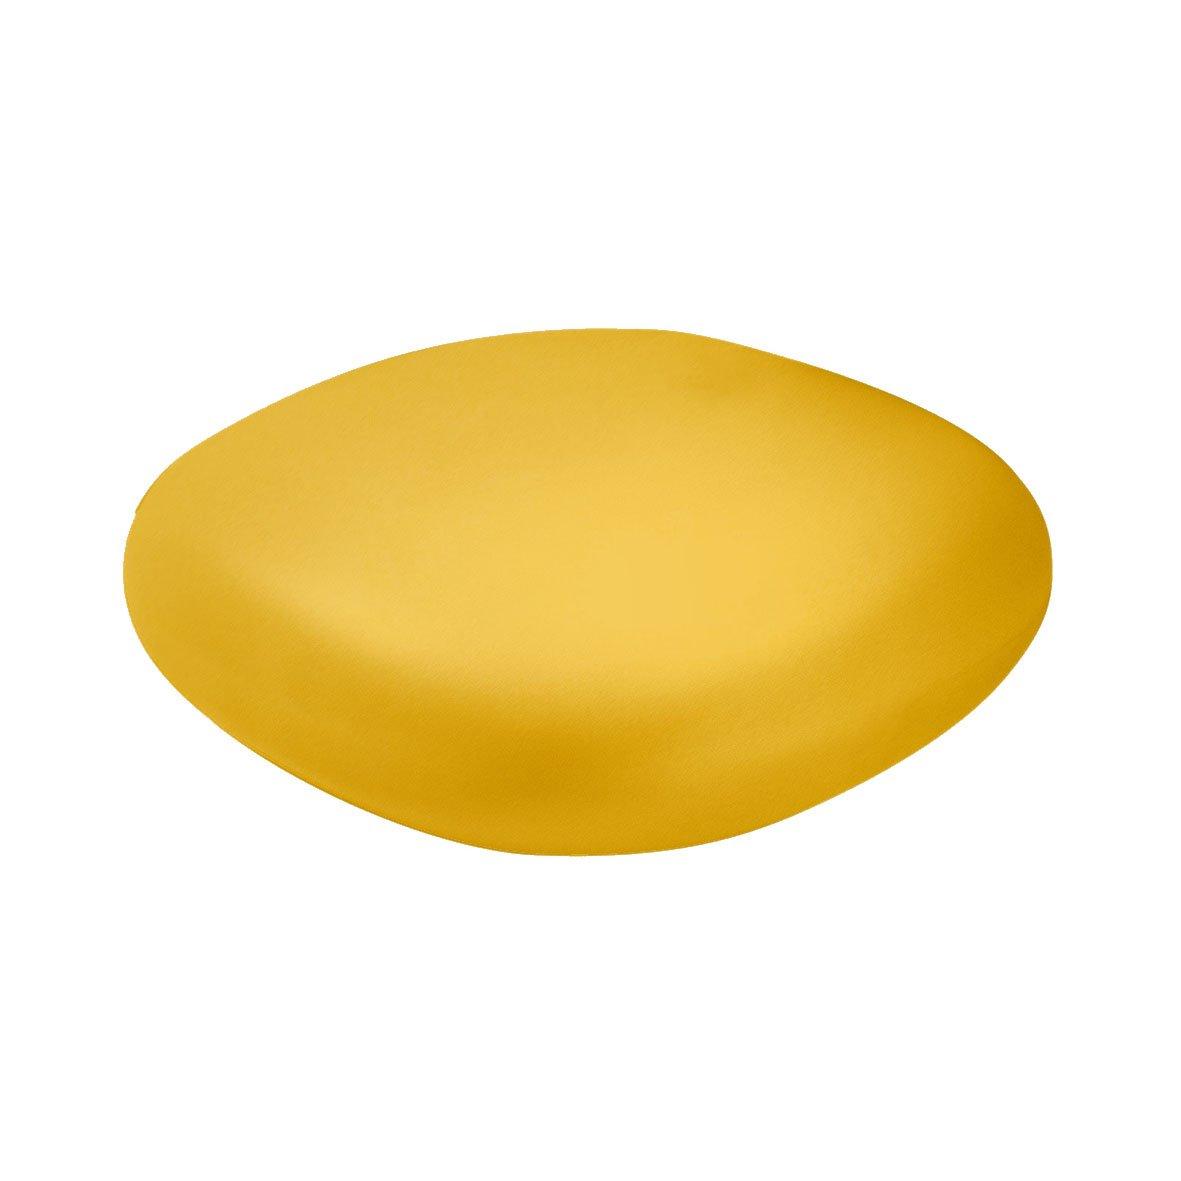 Slide Chubby Low Pouf - Small table Saffron Yellow